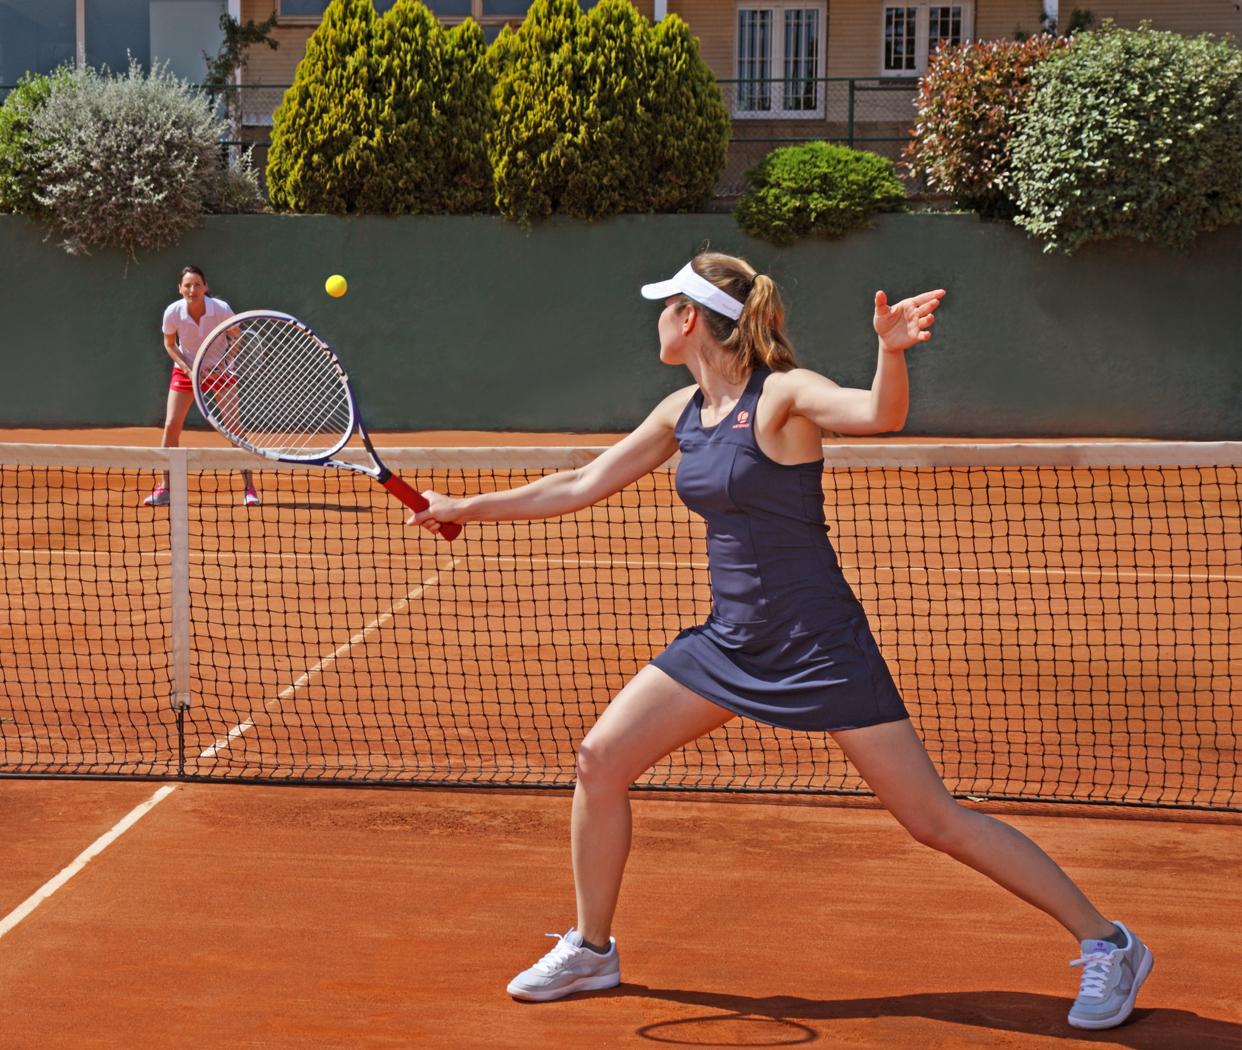 Cours de Tennis (€)